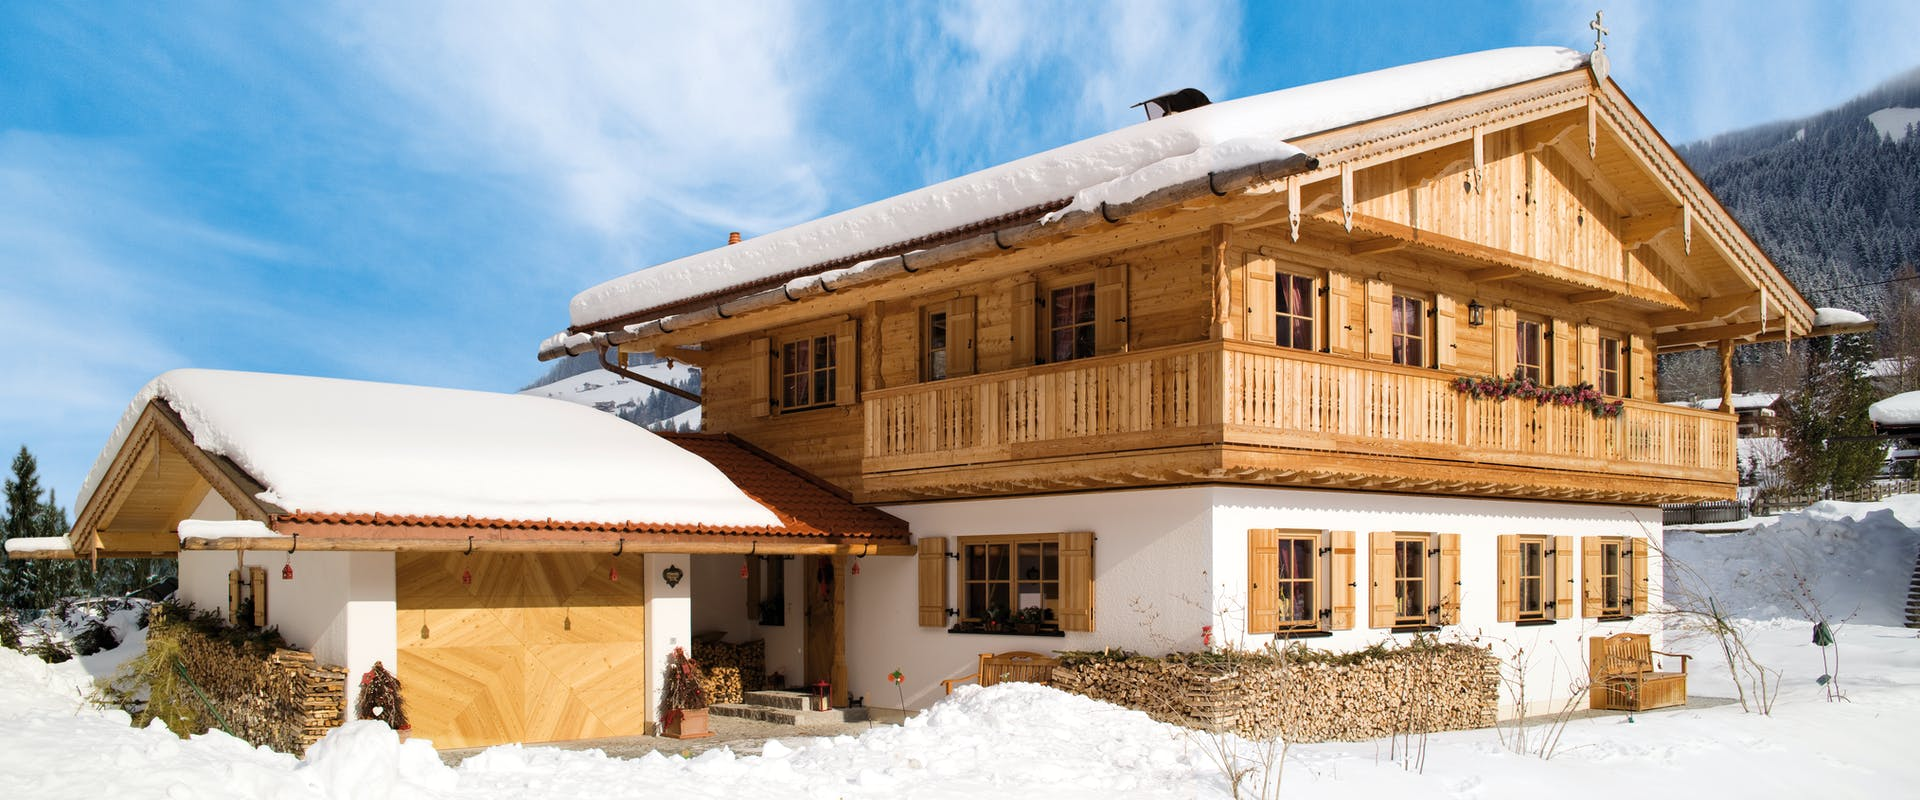 Fertighäuser im alpenländischen Baustil - Fertighaus.de Ratgeber